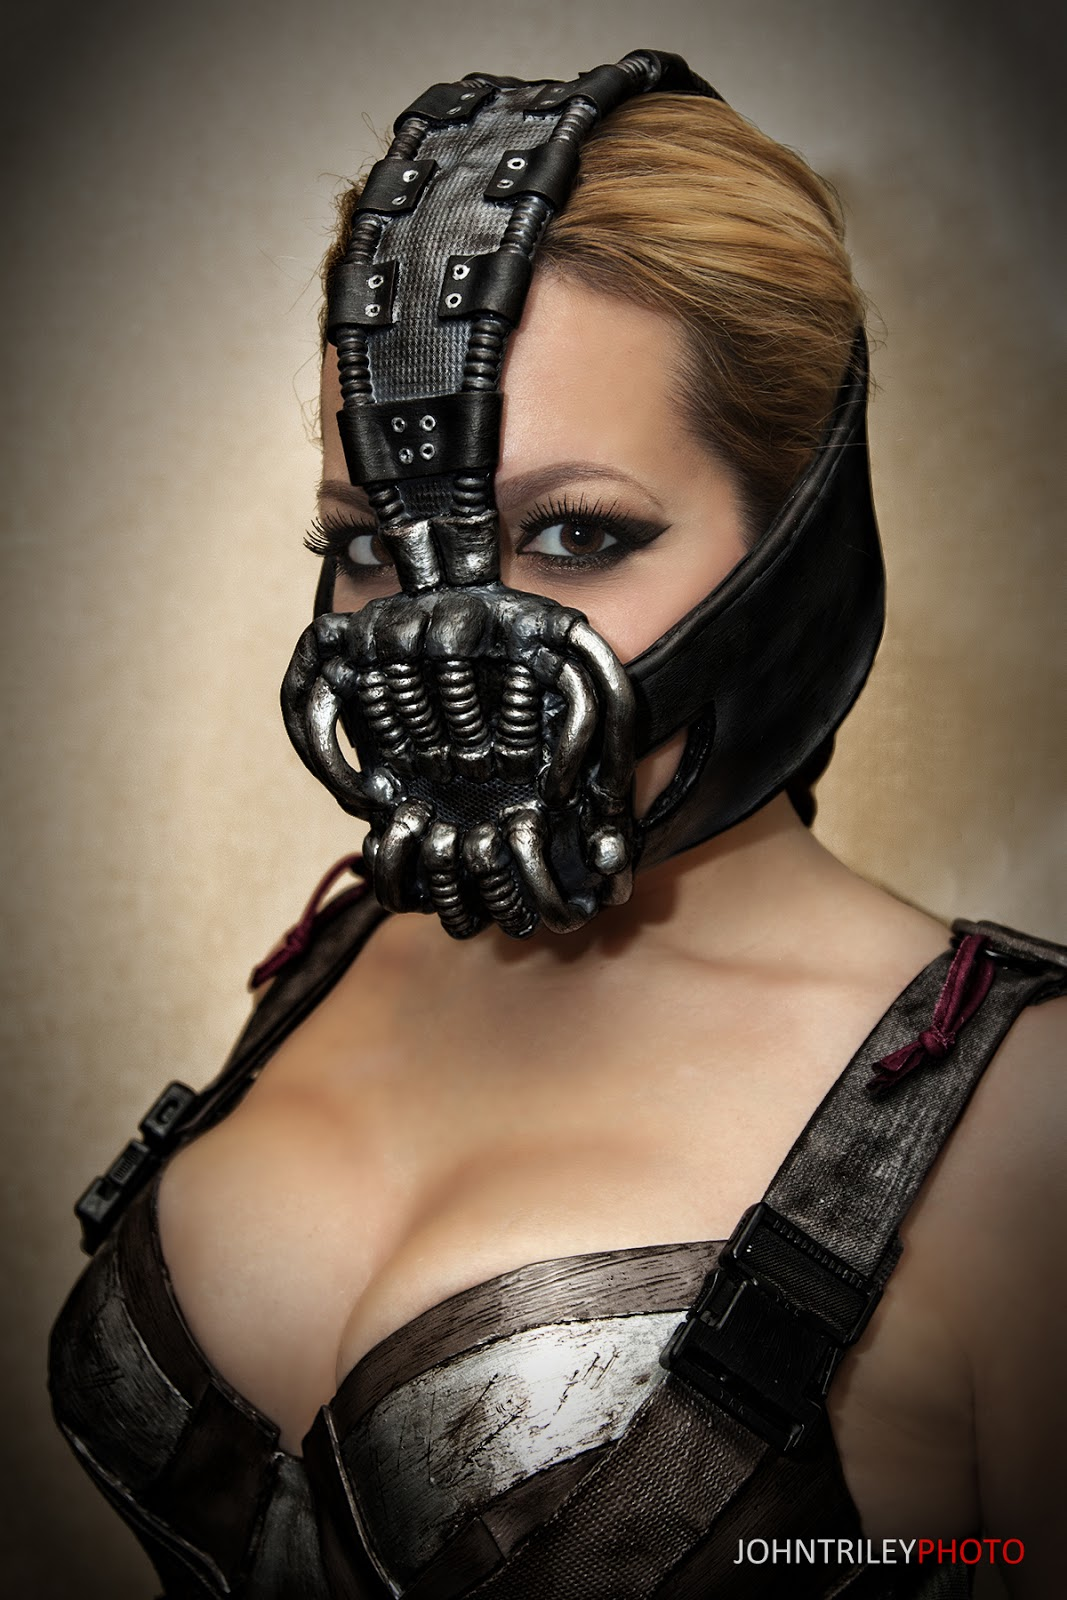 Bane Costume for Women & Bane Costume for Women - CrazyCoolGadgets